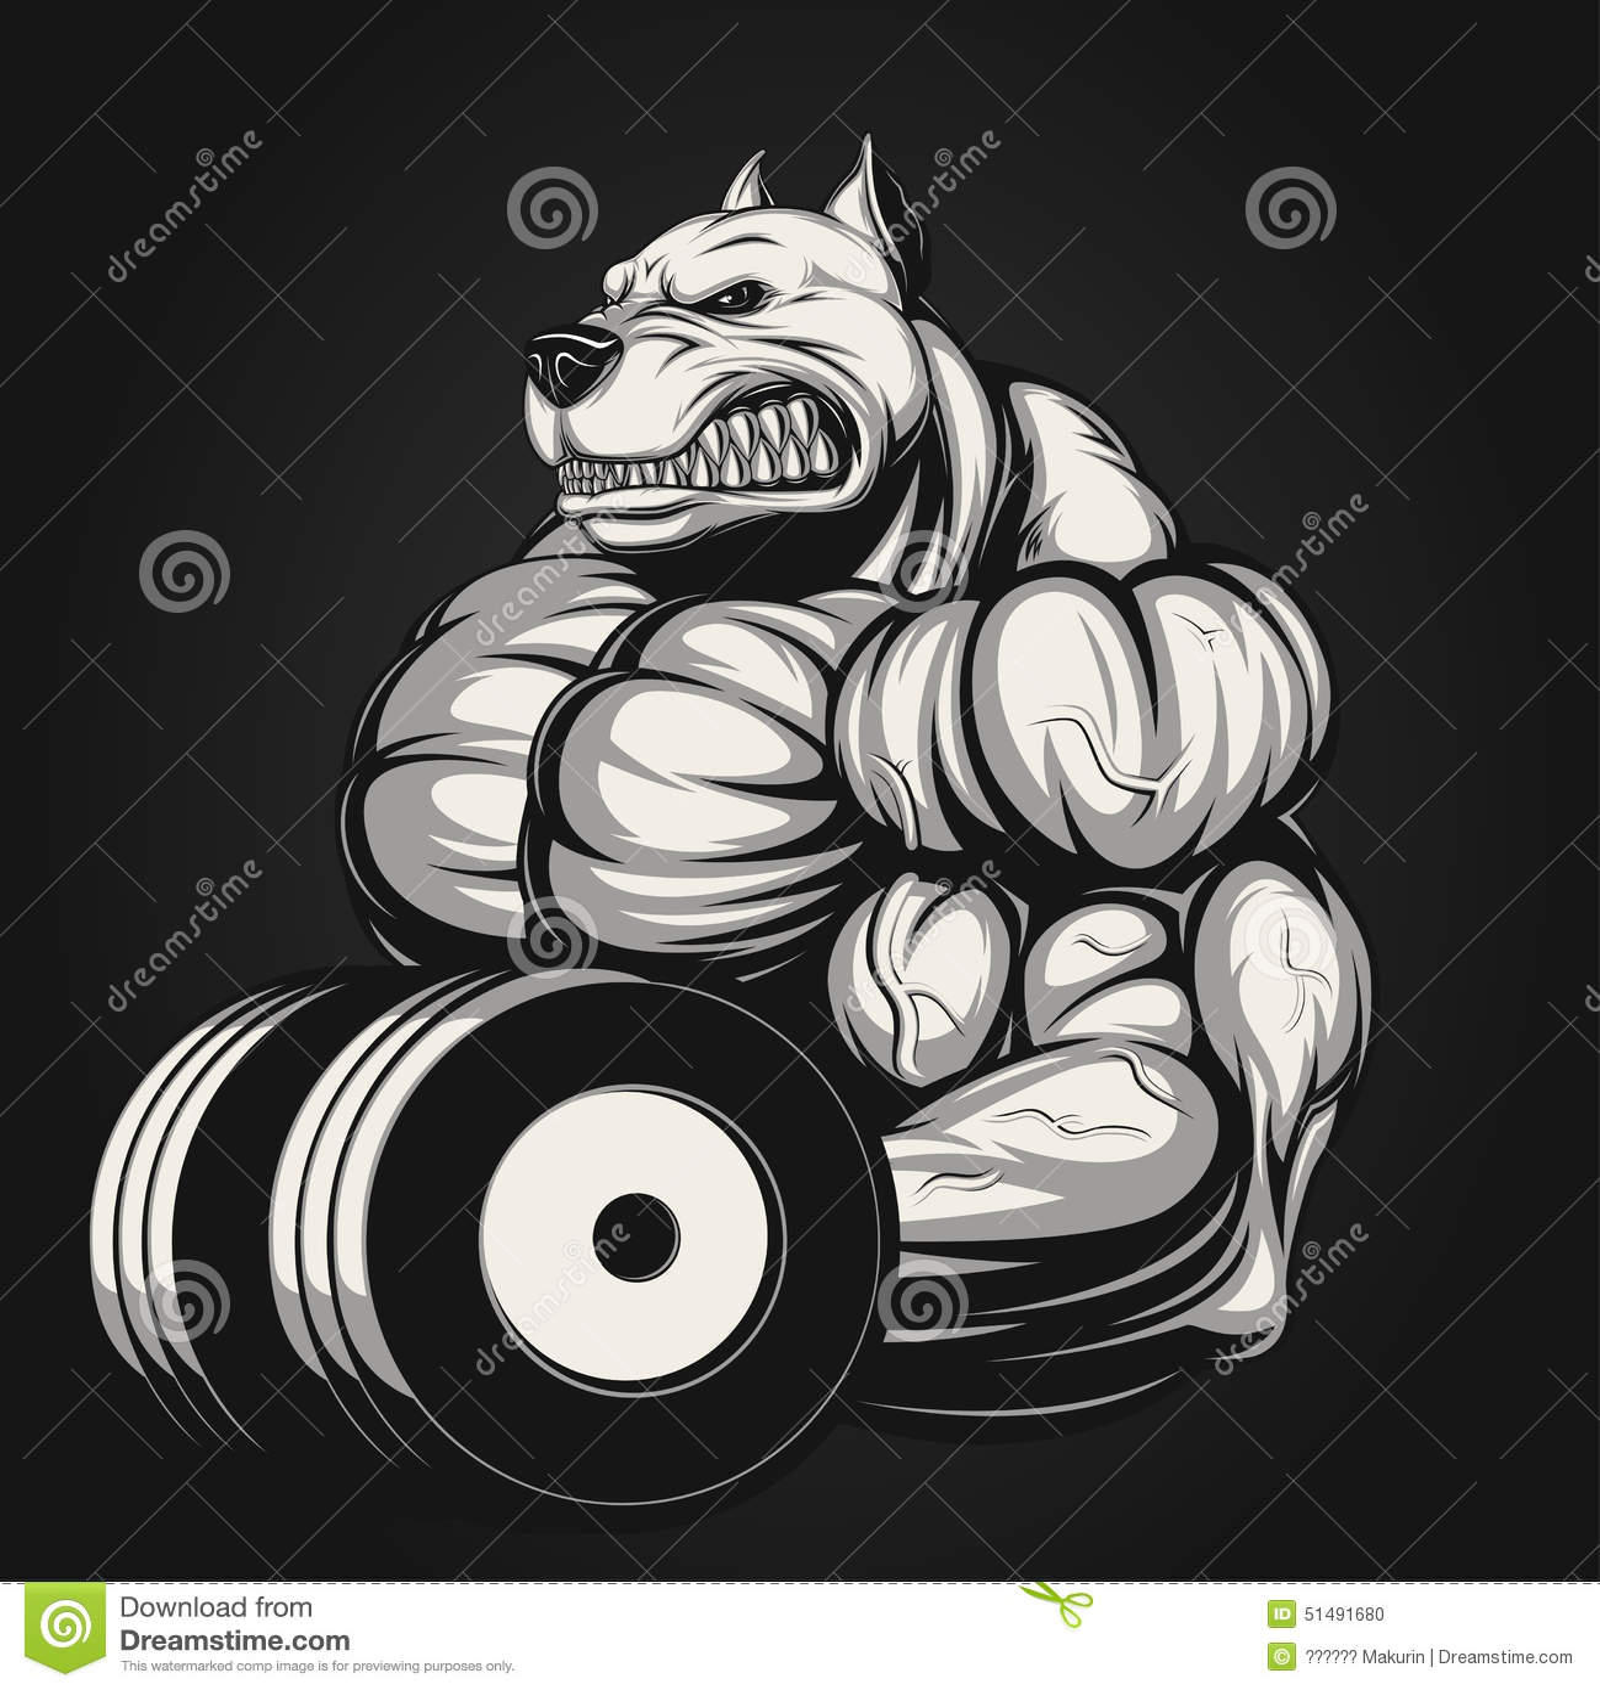 Dumbbell Icon Vector Strong dog stock vecto...